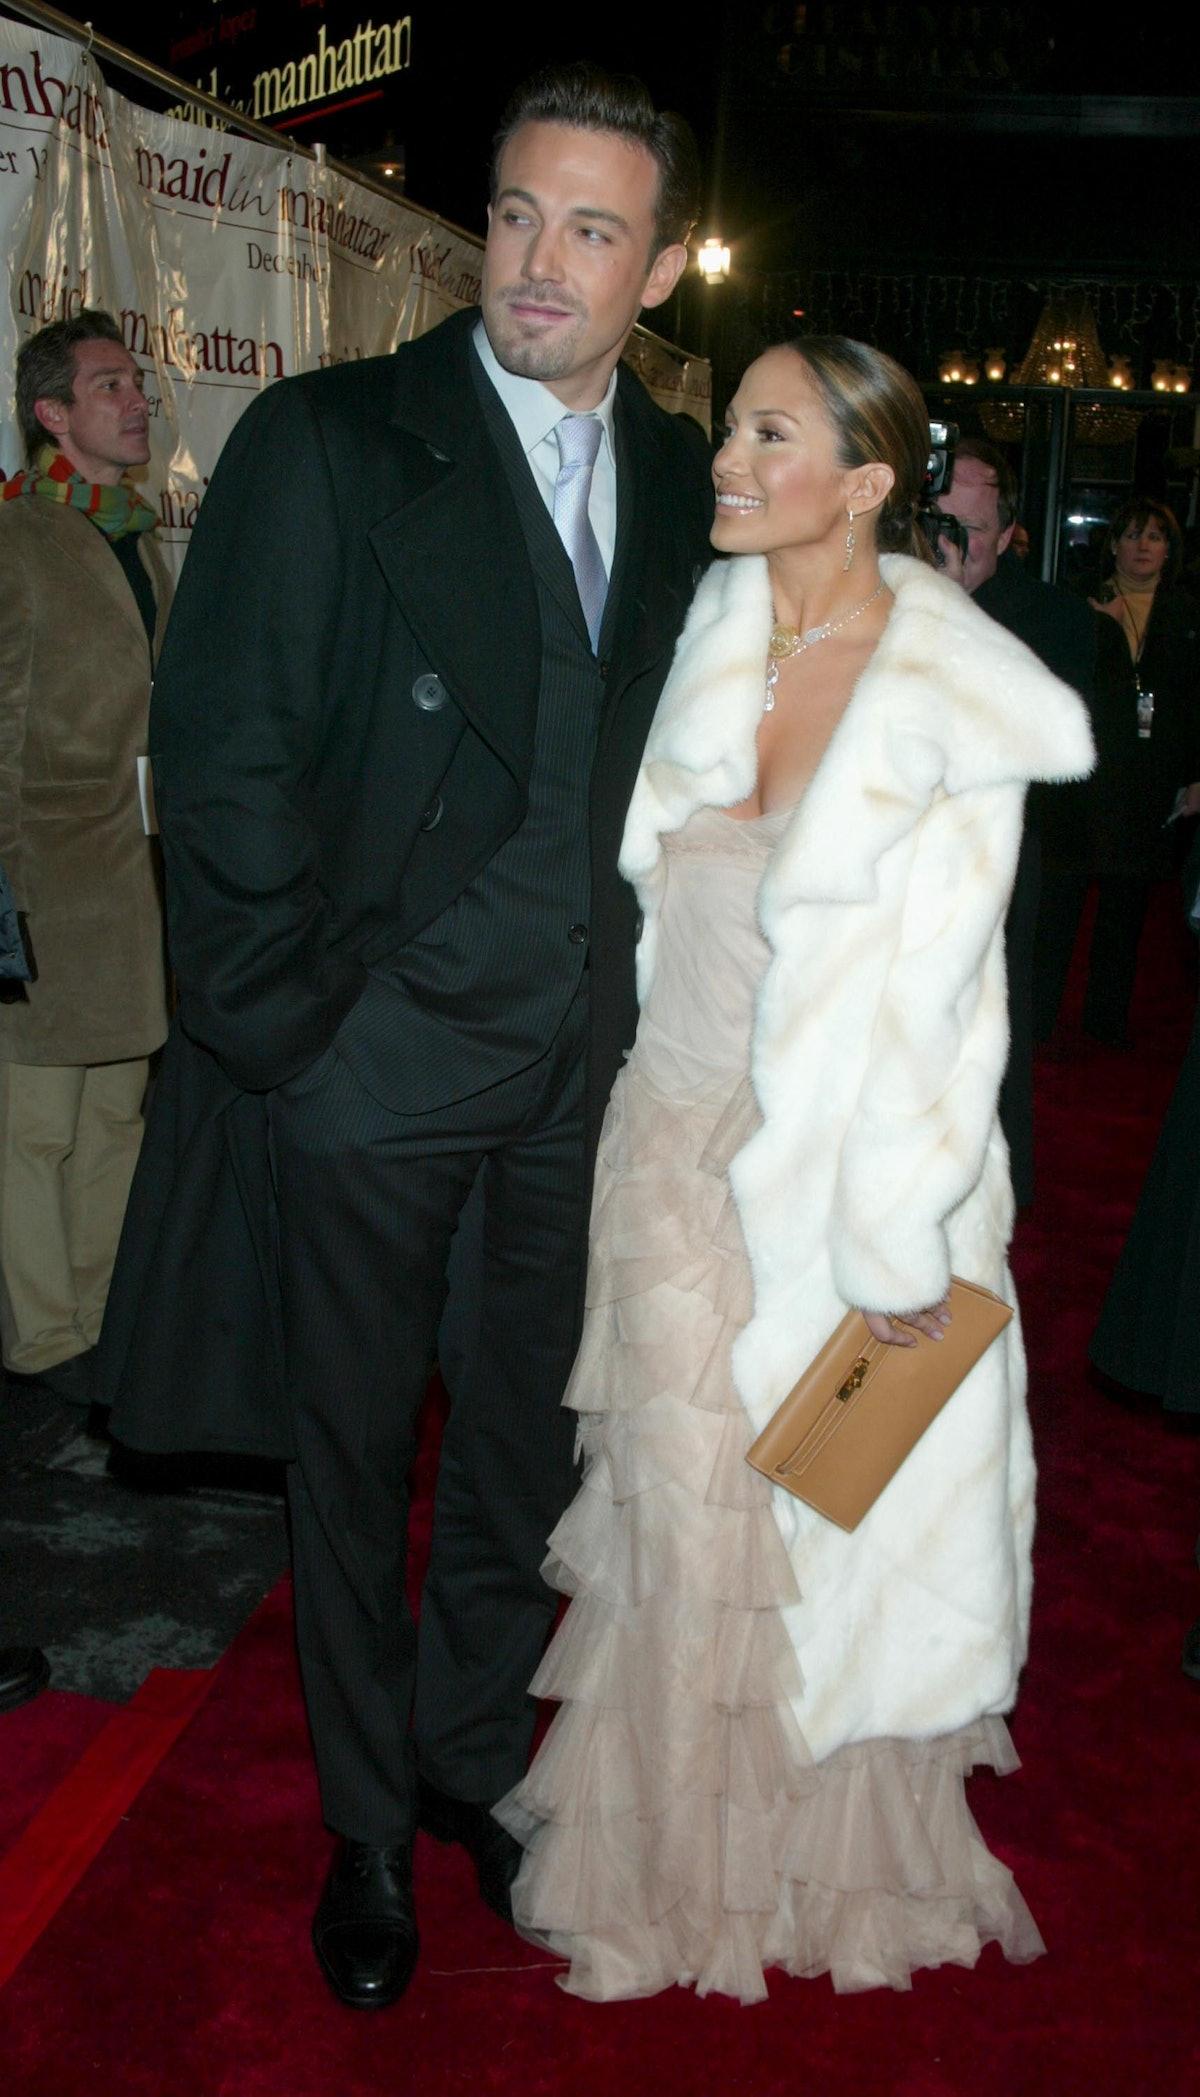 Ben Affleck & Jennifer Lopez during Maid in Manhattan Premiere - Arrivals at The Ziegfeld Theatre in...